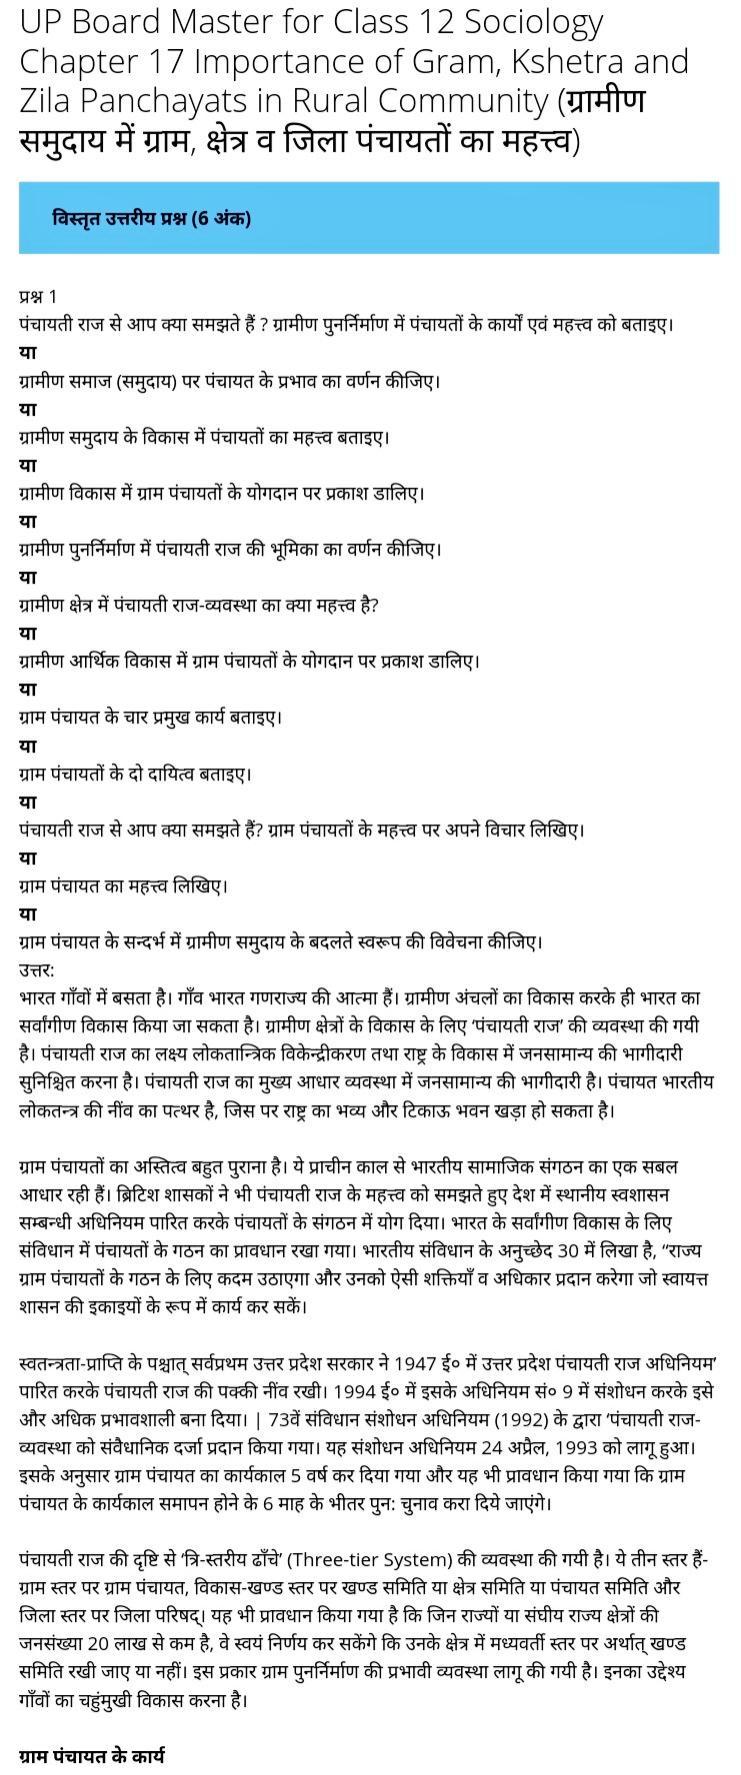 UP Board Solutions for Class 12 Sociology Chapter 17 Importance of Gram, Kshetra and Zila Panchayats in Rural Community (ग्रामीण समुदाय में ग्राम, क्षेत्र व जिला पंचायतों का महत्त्व)